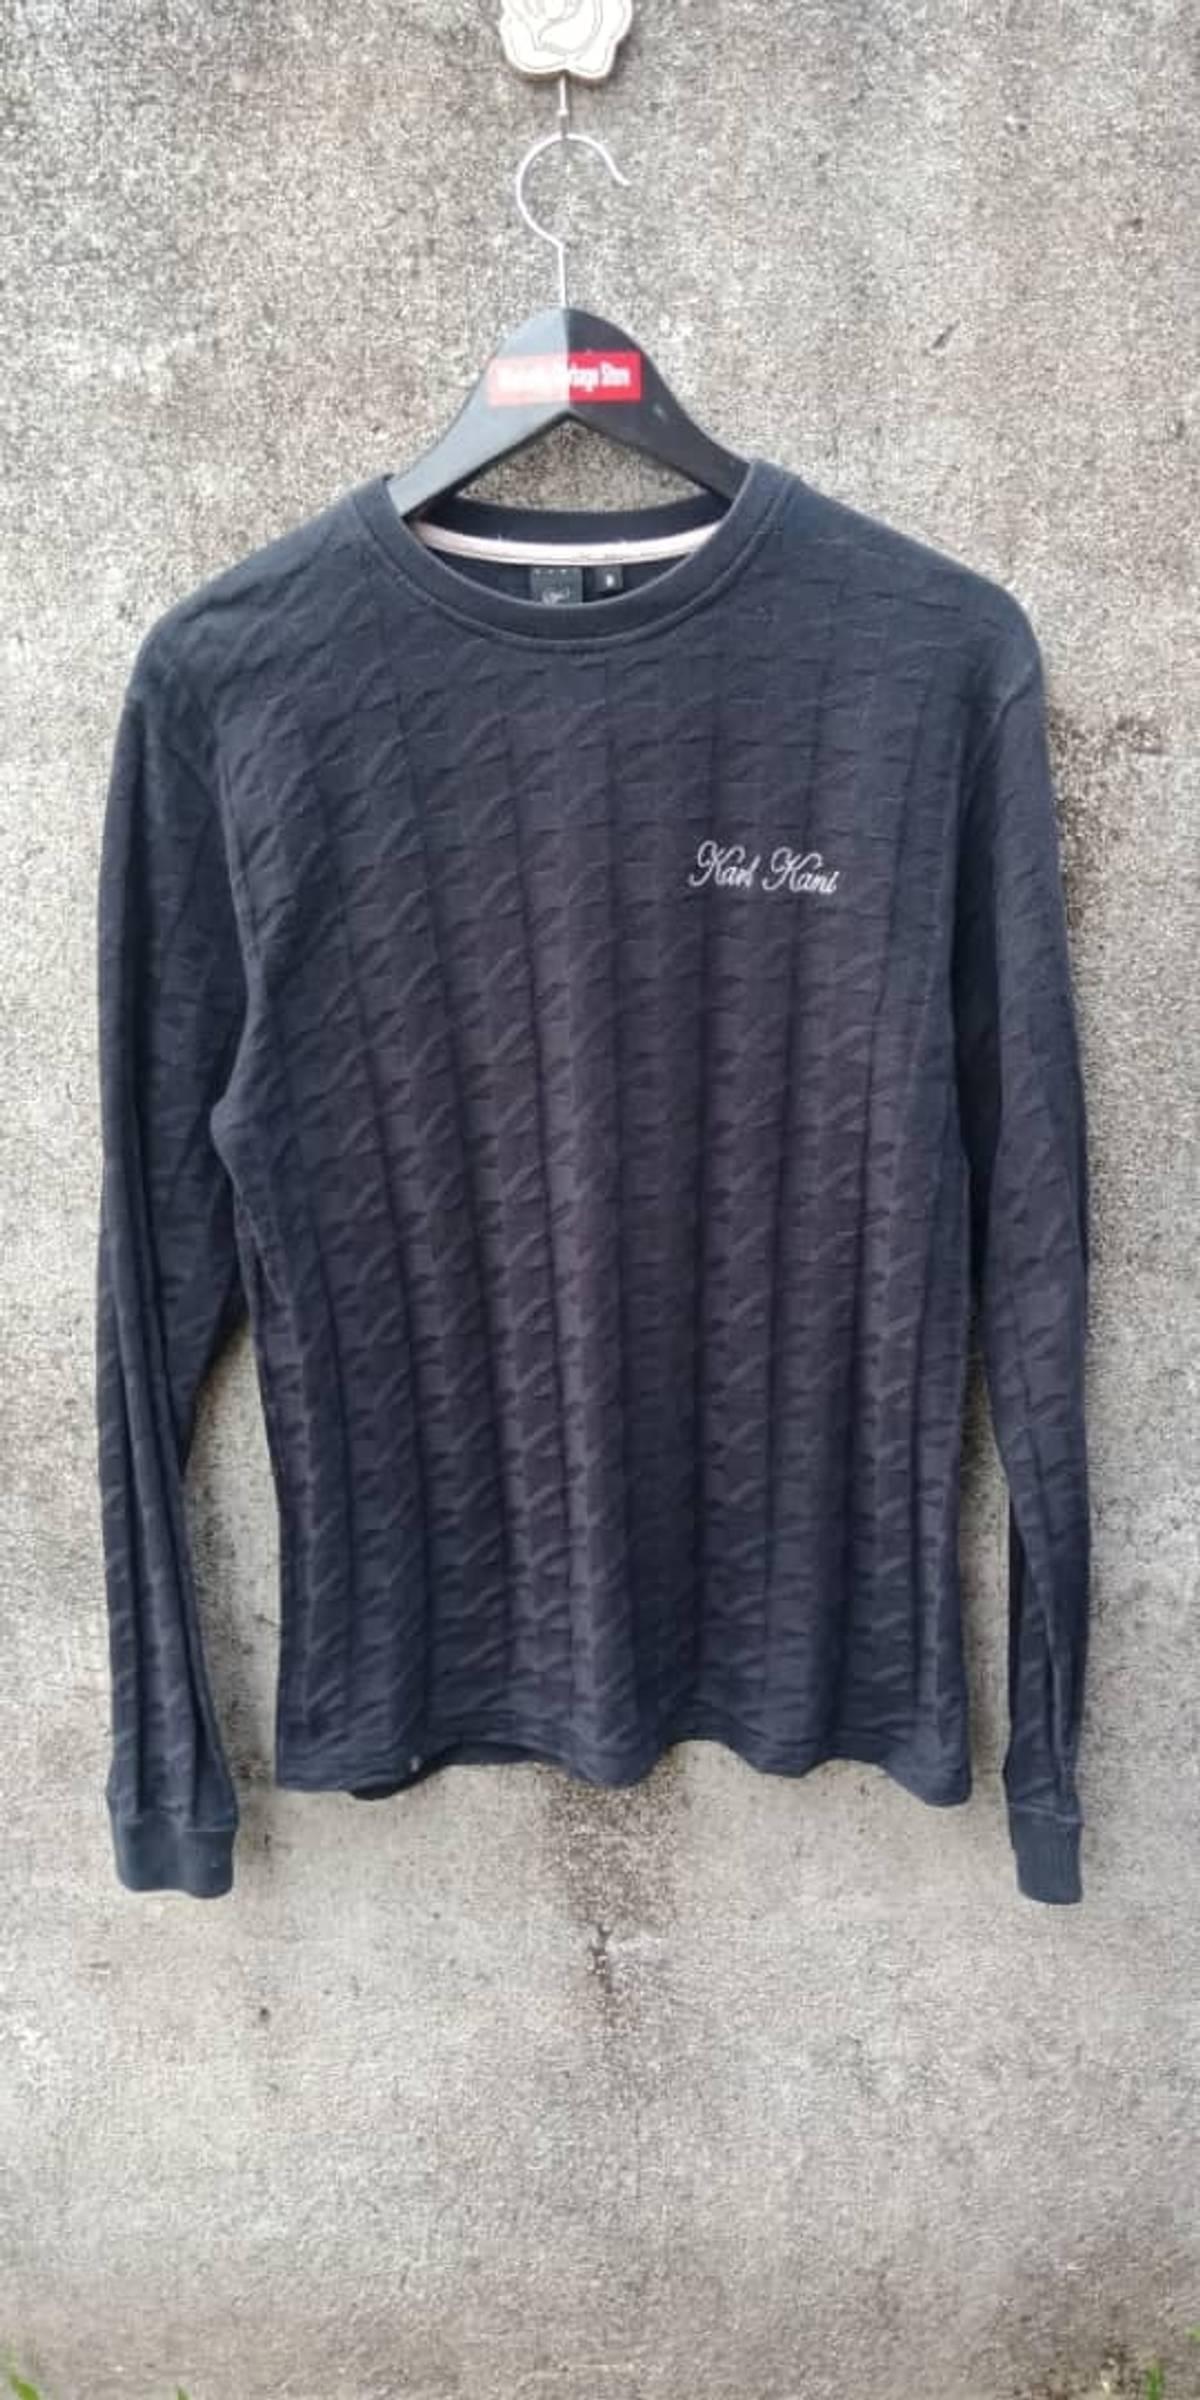 3d25cc1f6f Designer × Karl Kani Karl Kani Embroidery Sweatshirt Size M $63